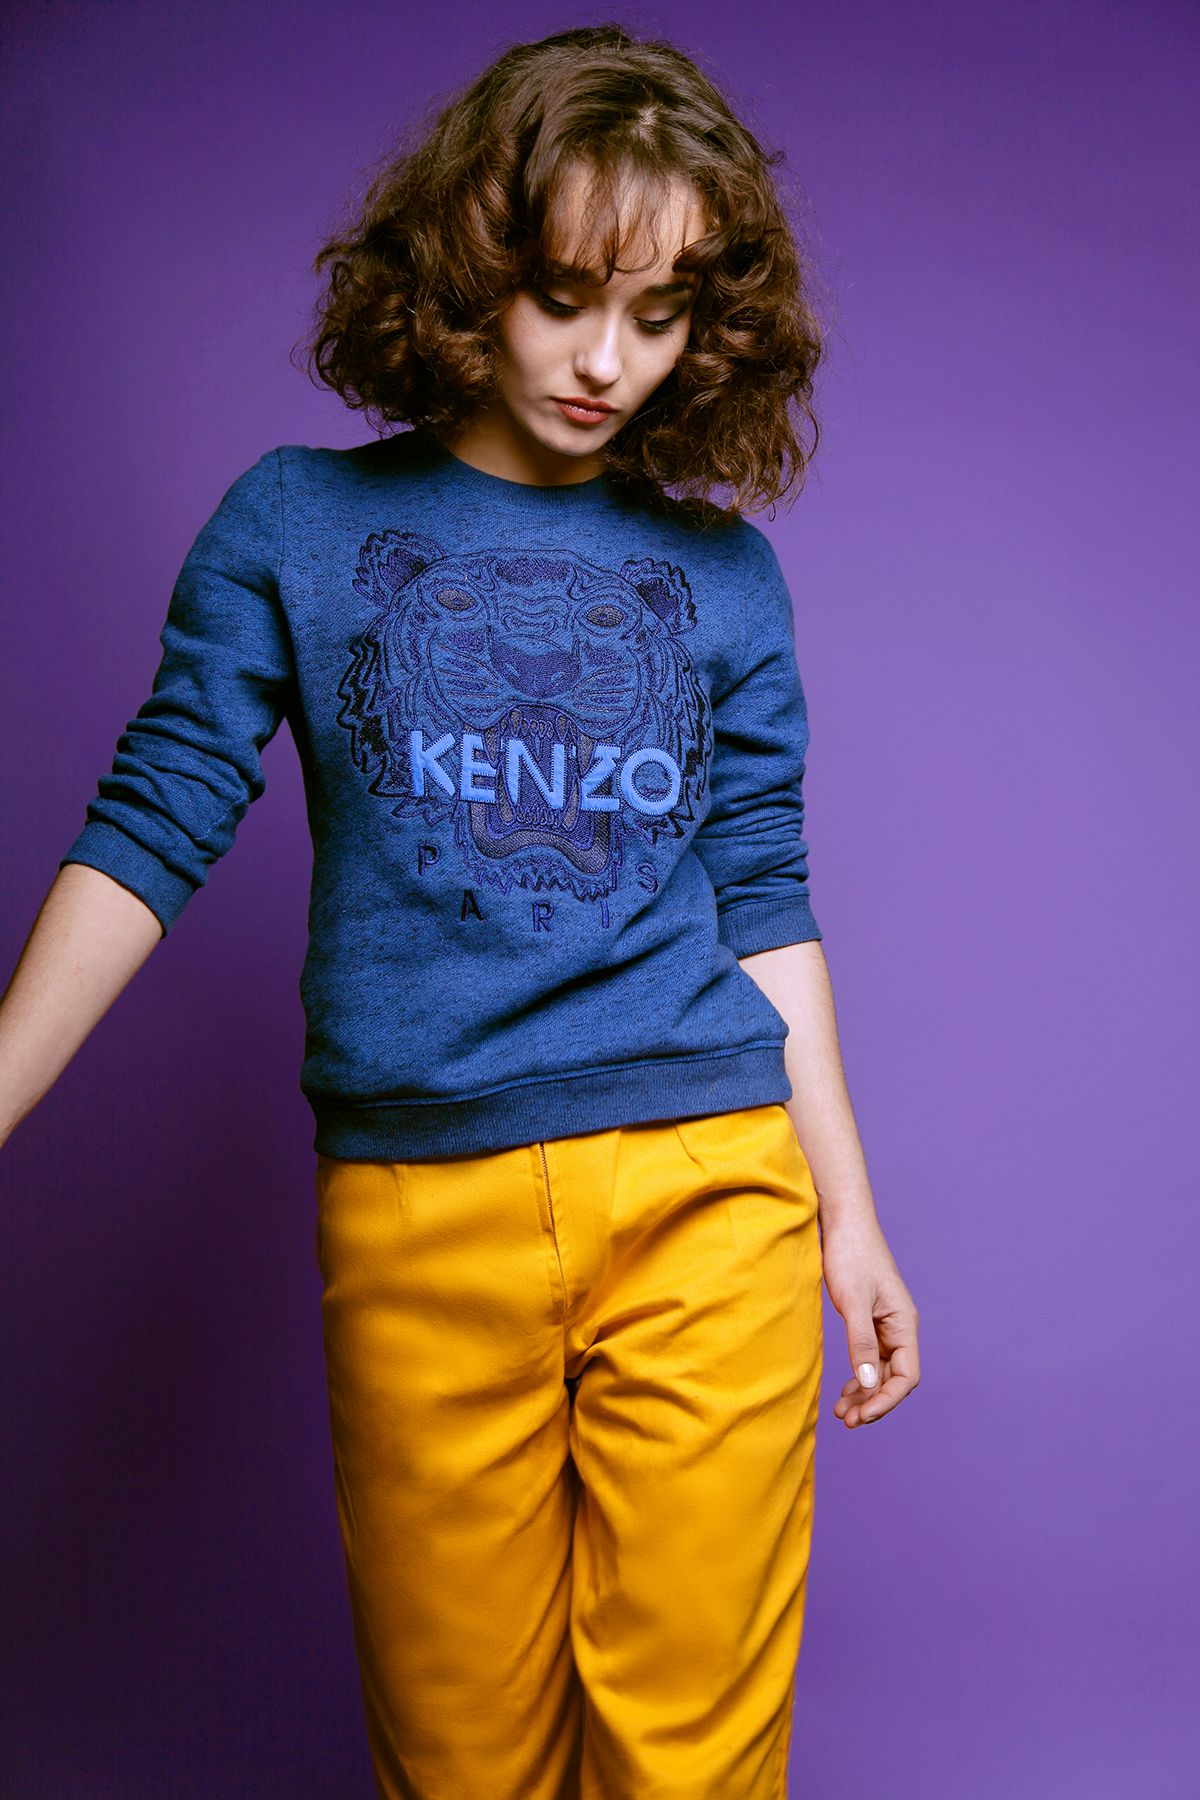 Kimdary_yin_Fashion_photographer_photographe_mode